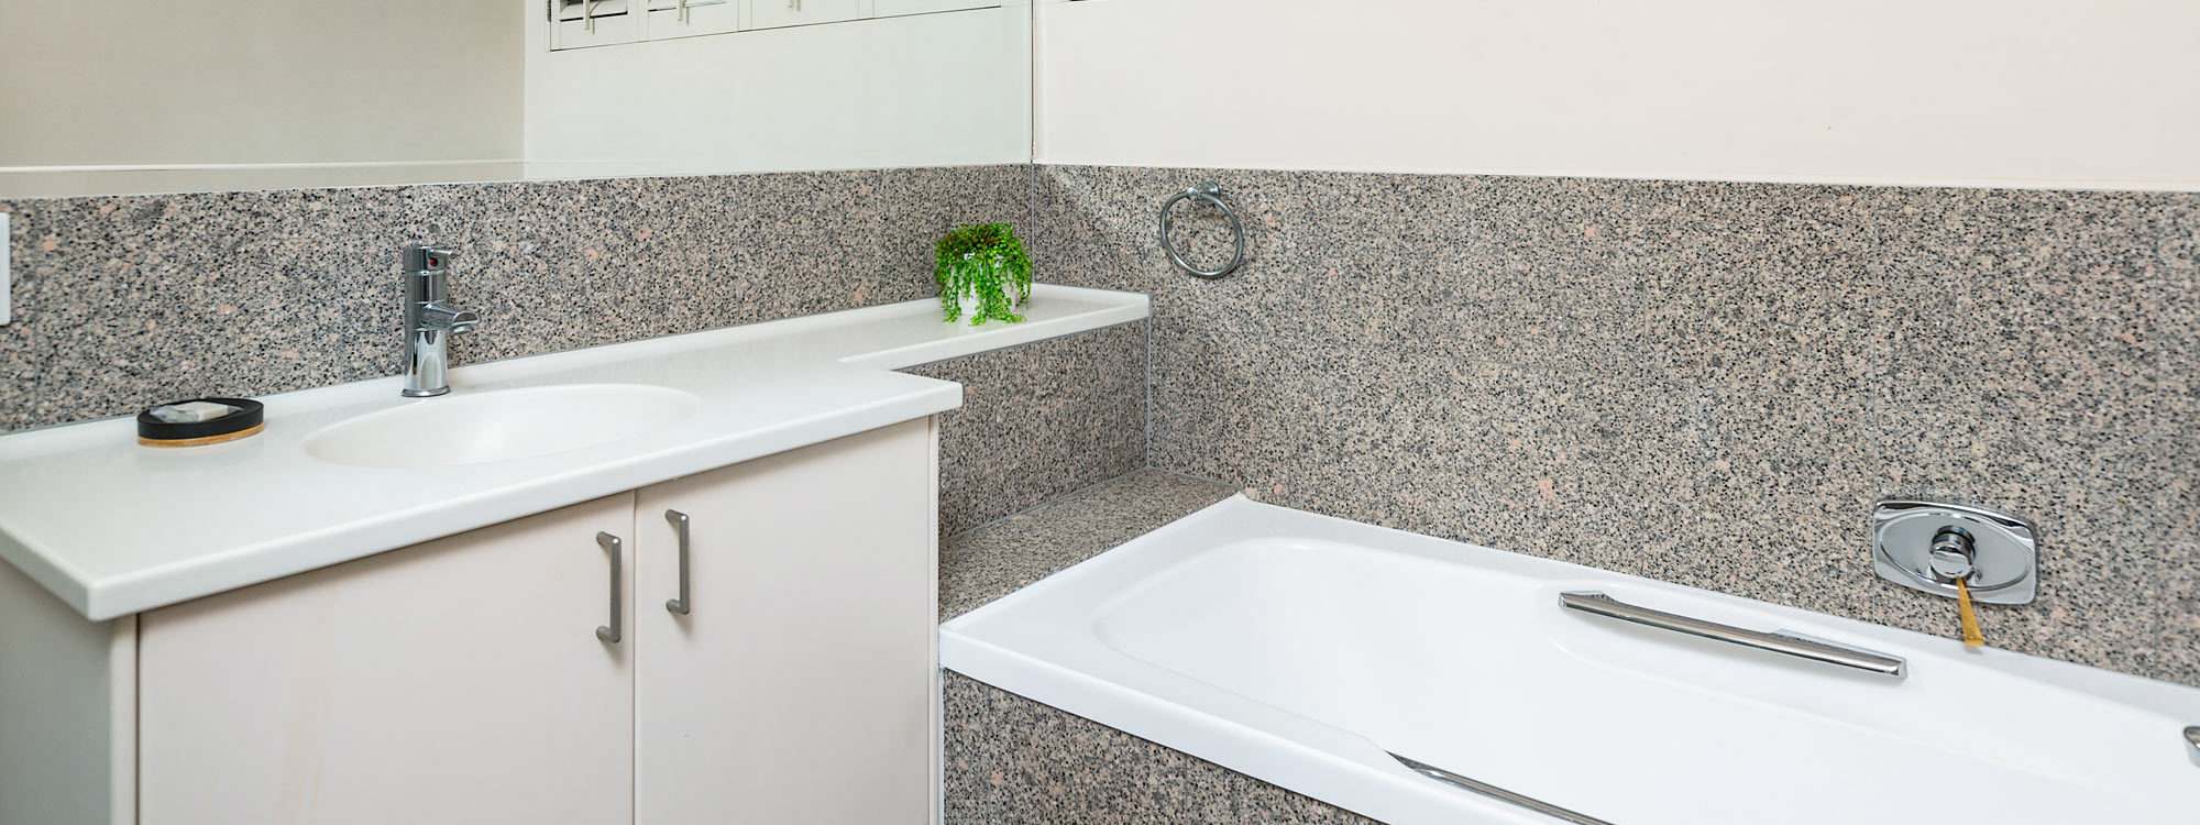 Casa Aqua - Gold Coast - Bathroom Downstairs